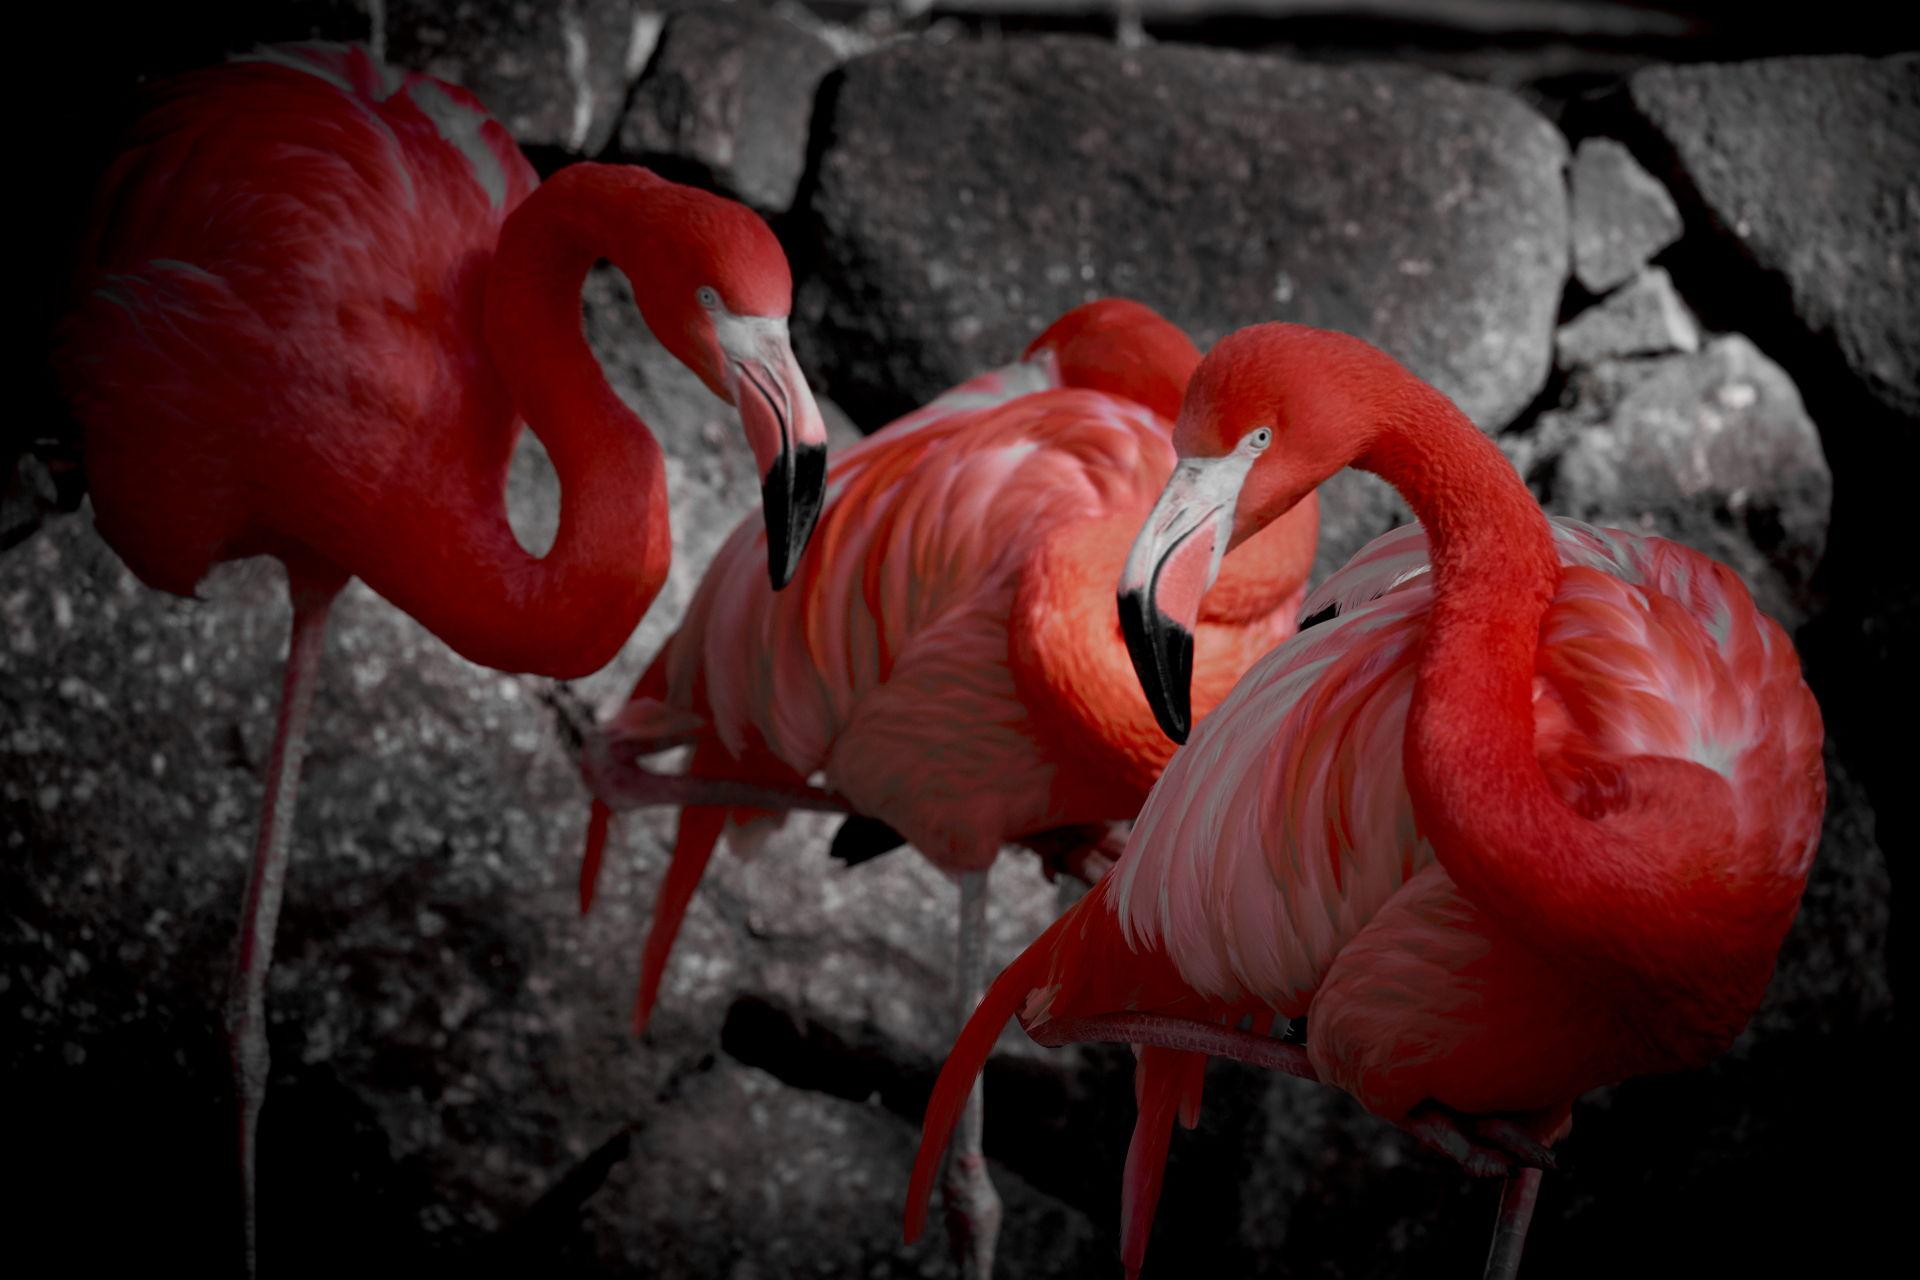 Flamingo looking me